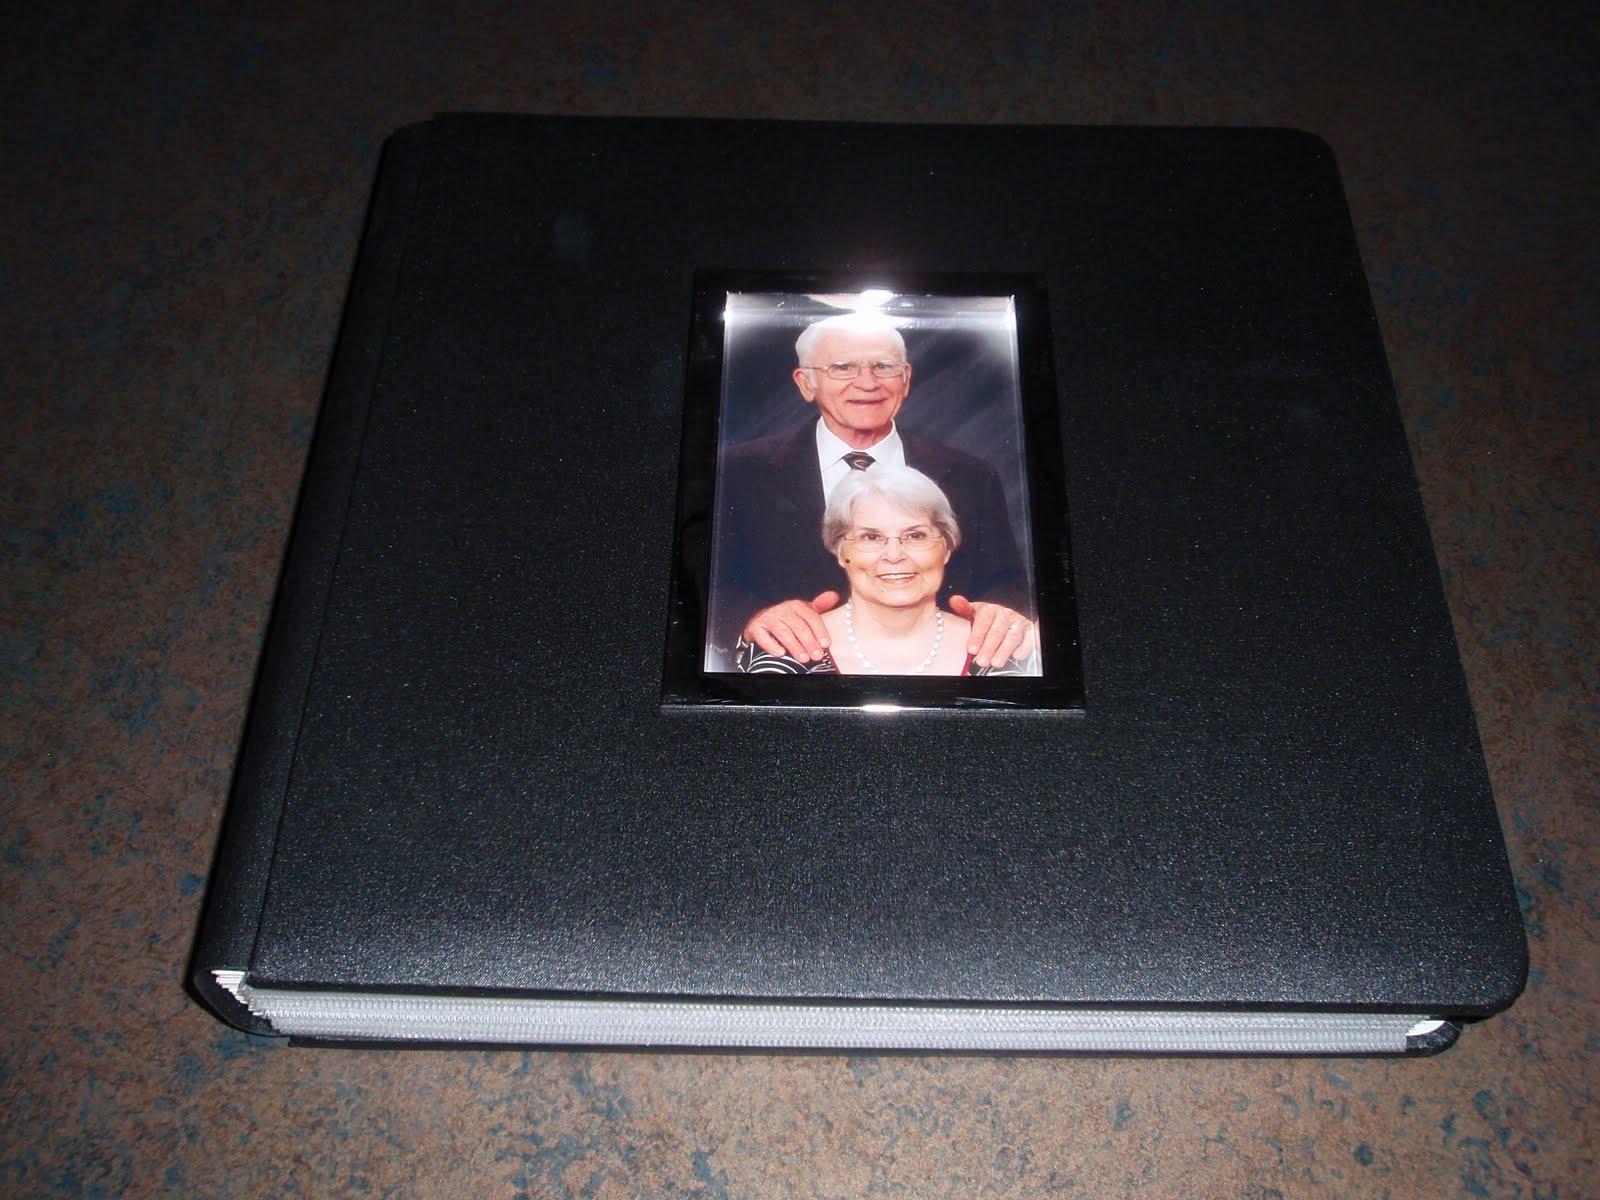 Oxford impressions 50th wedding anniversary scrapbooking for 50th wedding anniversary gifts ideas